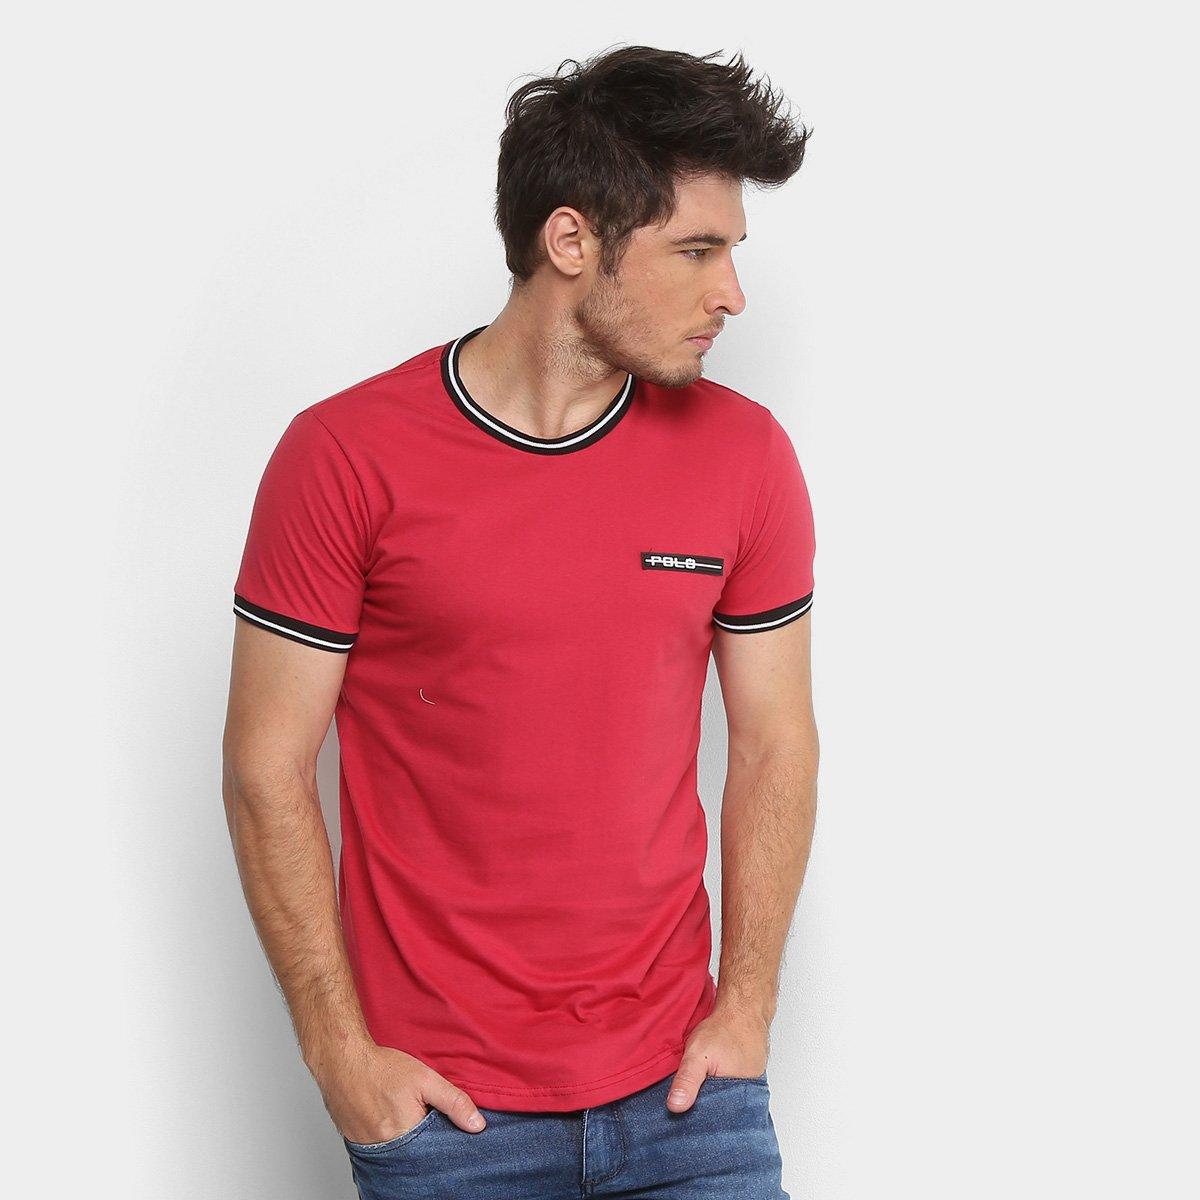 d056d3c6c Camiseta Polo RG 518 Retilínea Masculina